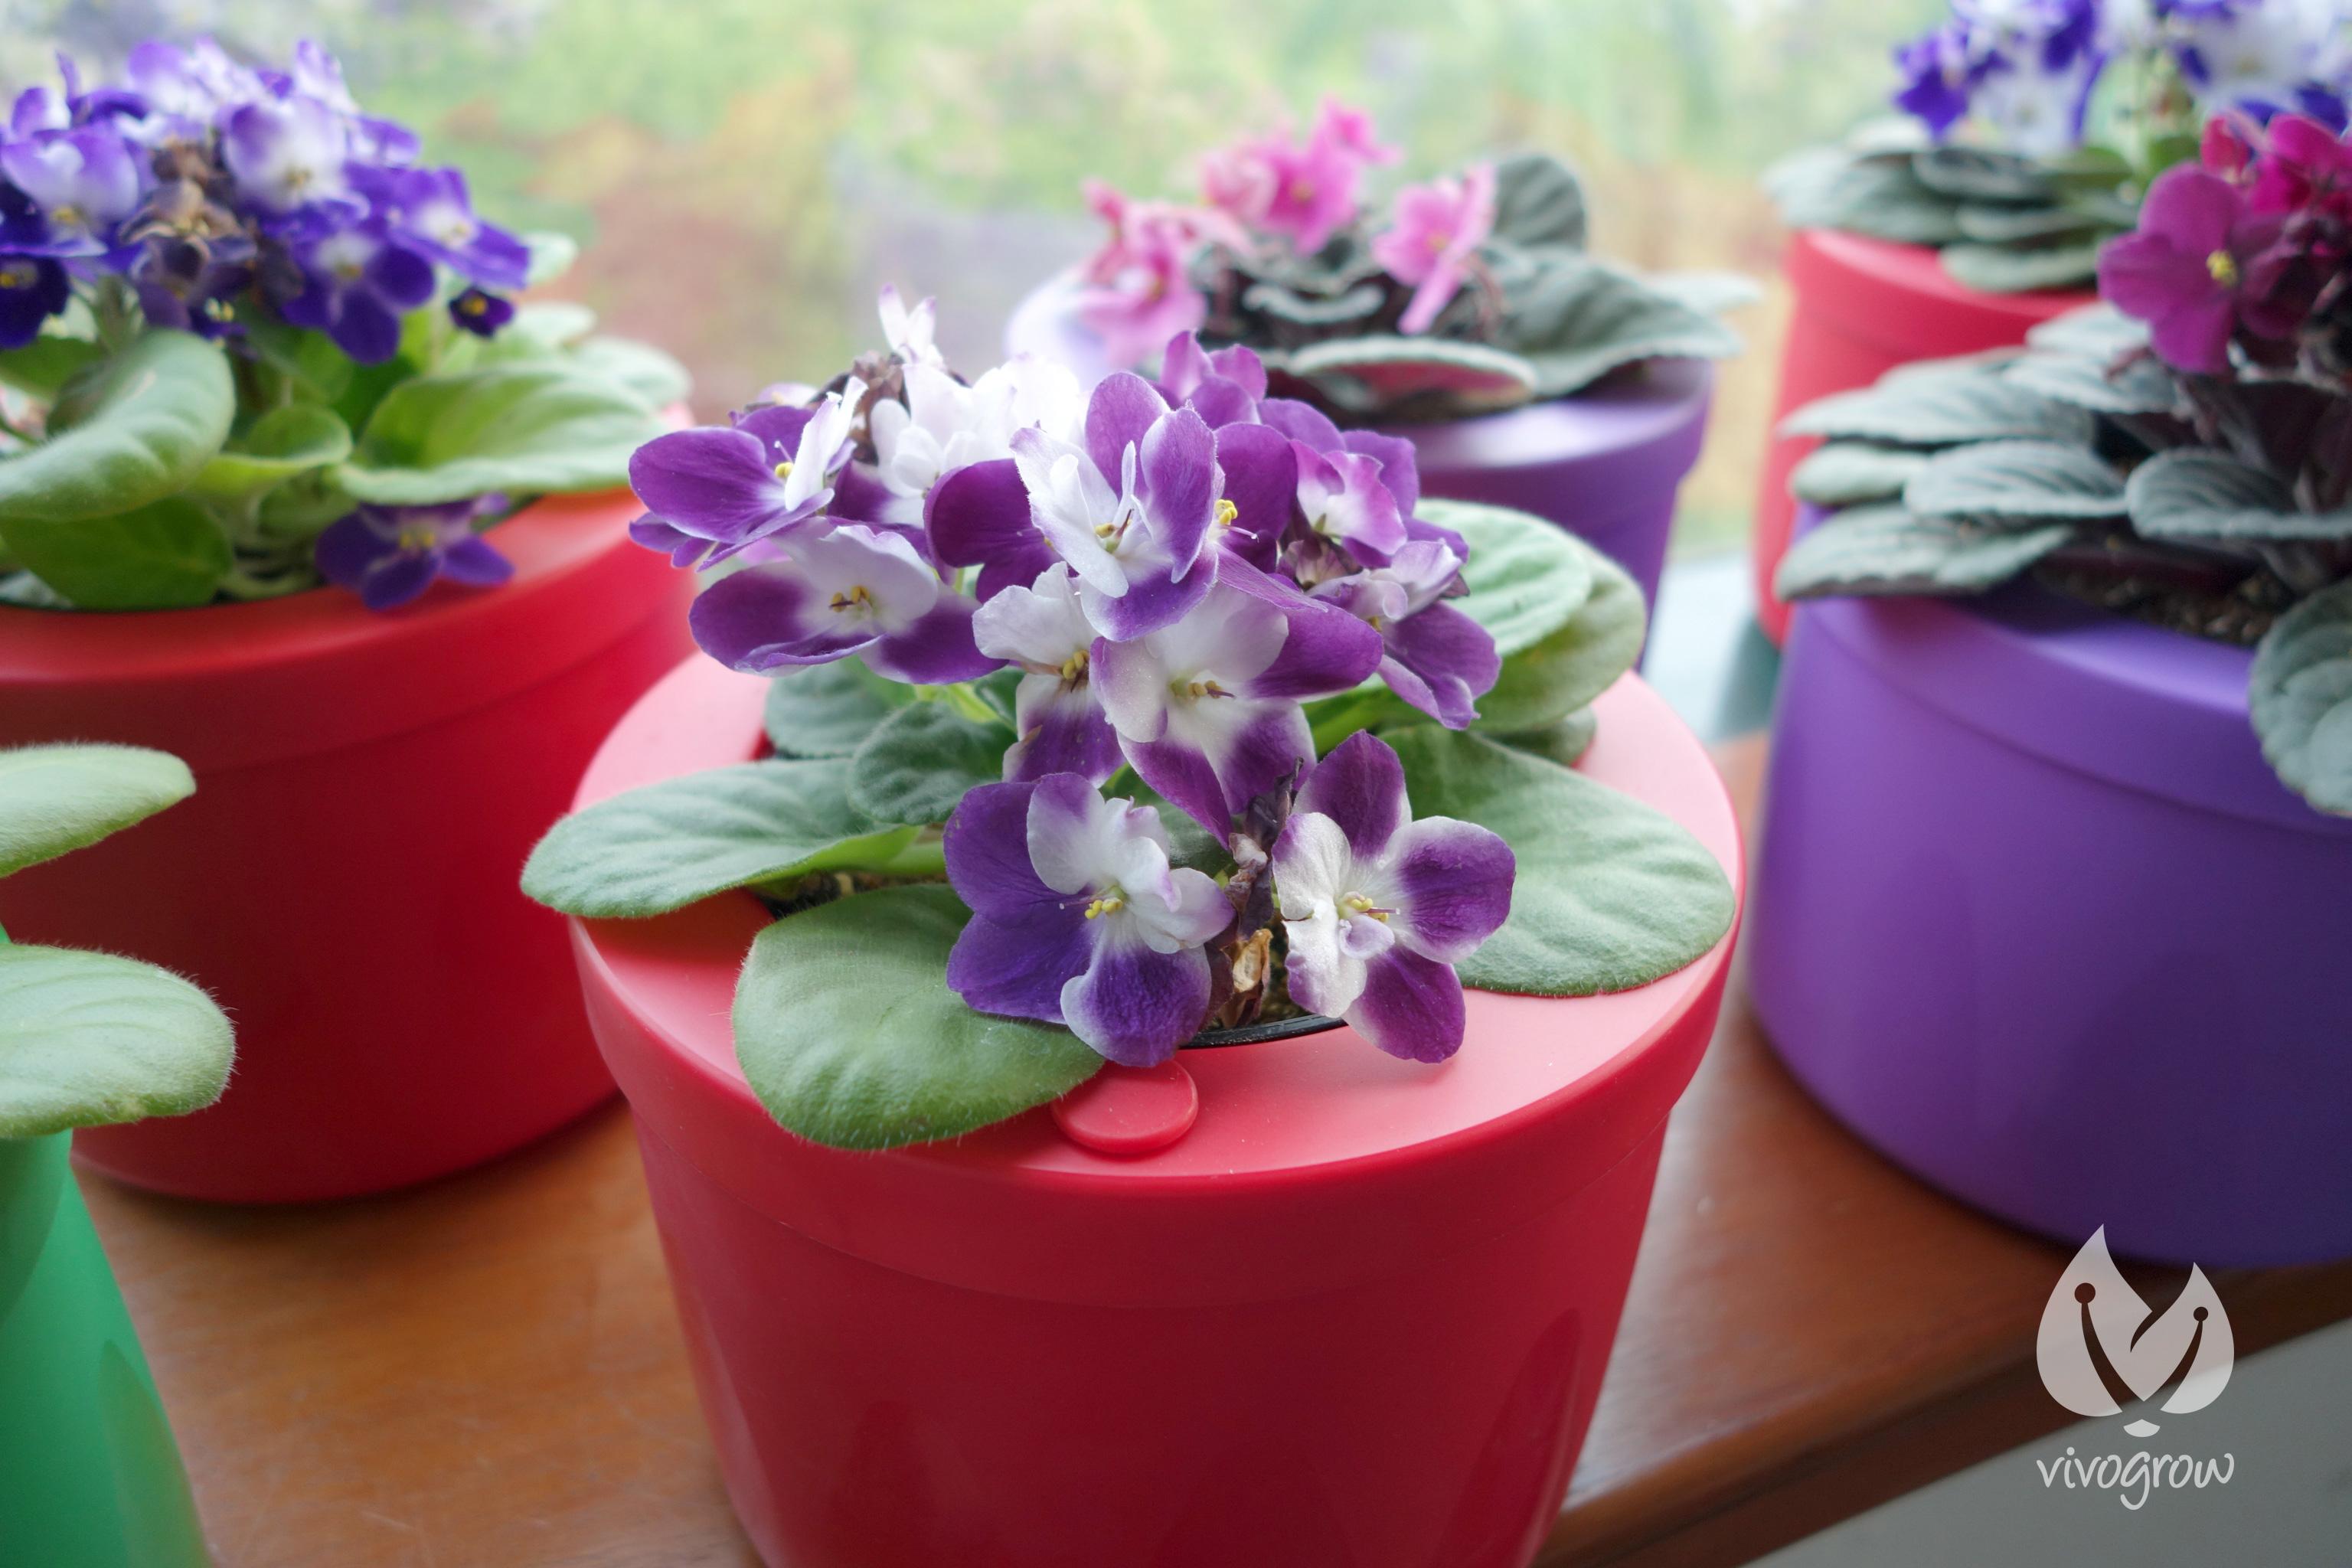 Vivogrow Herb Pot Plant Driven Technology To Meet Growing